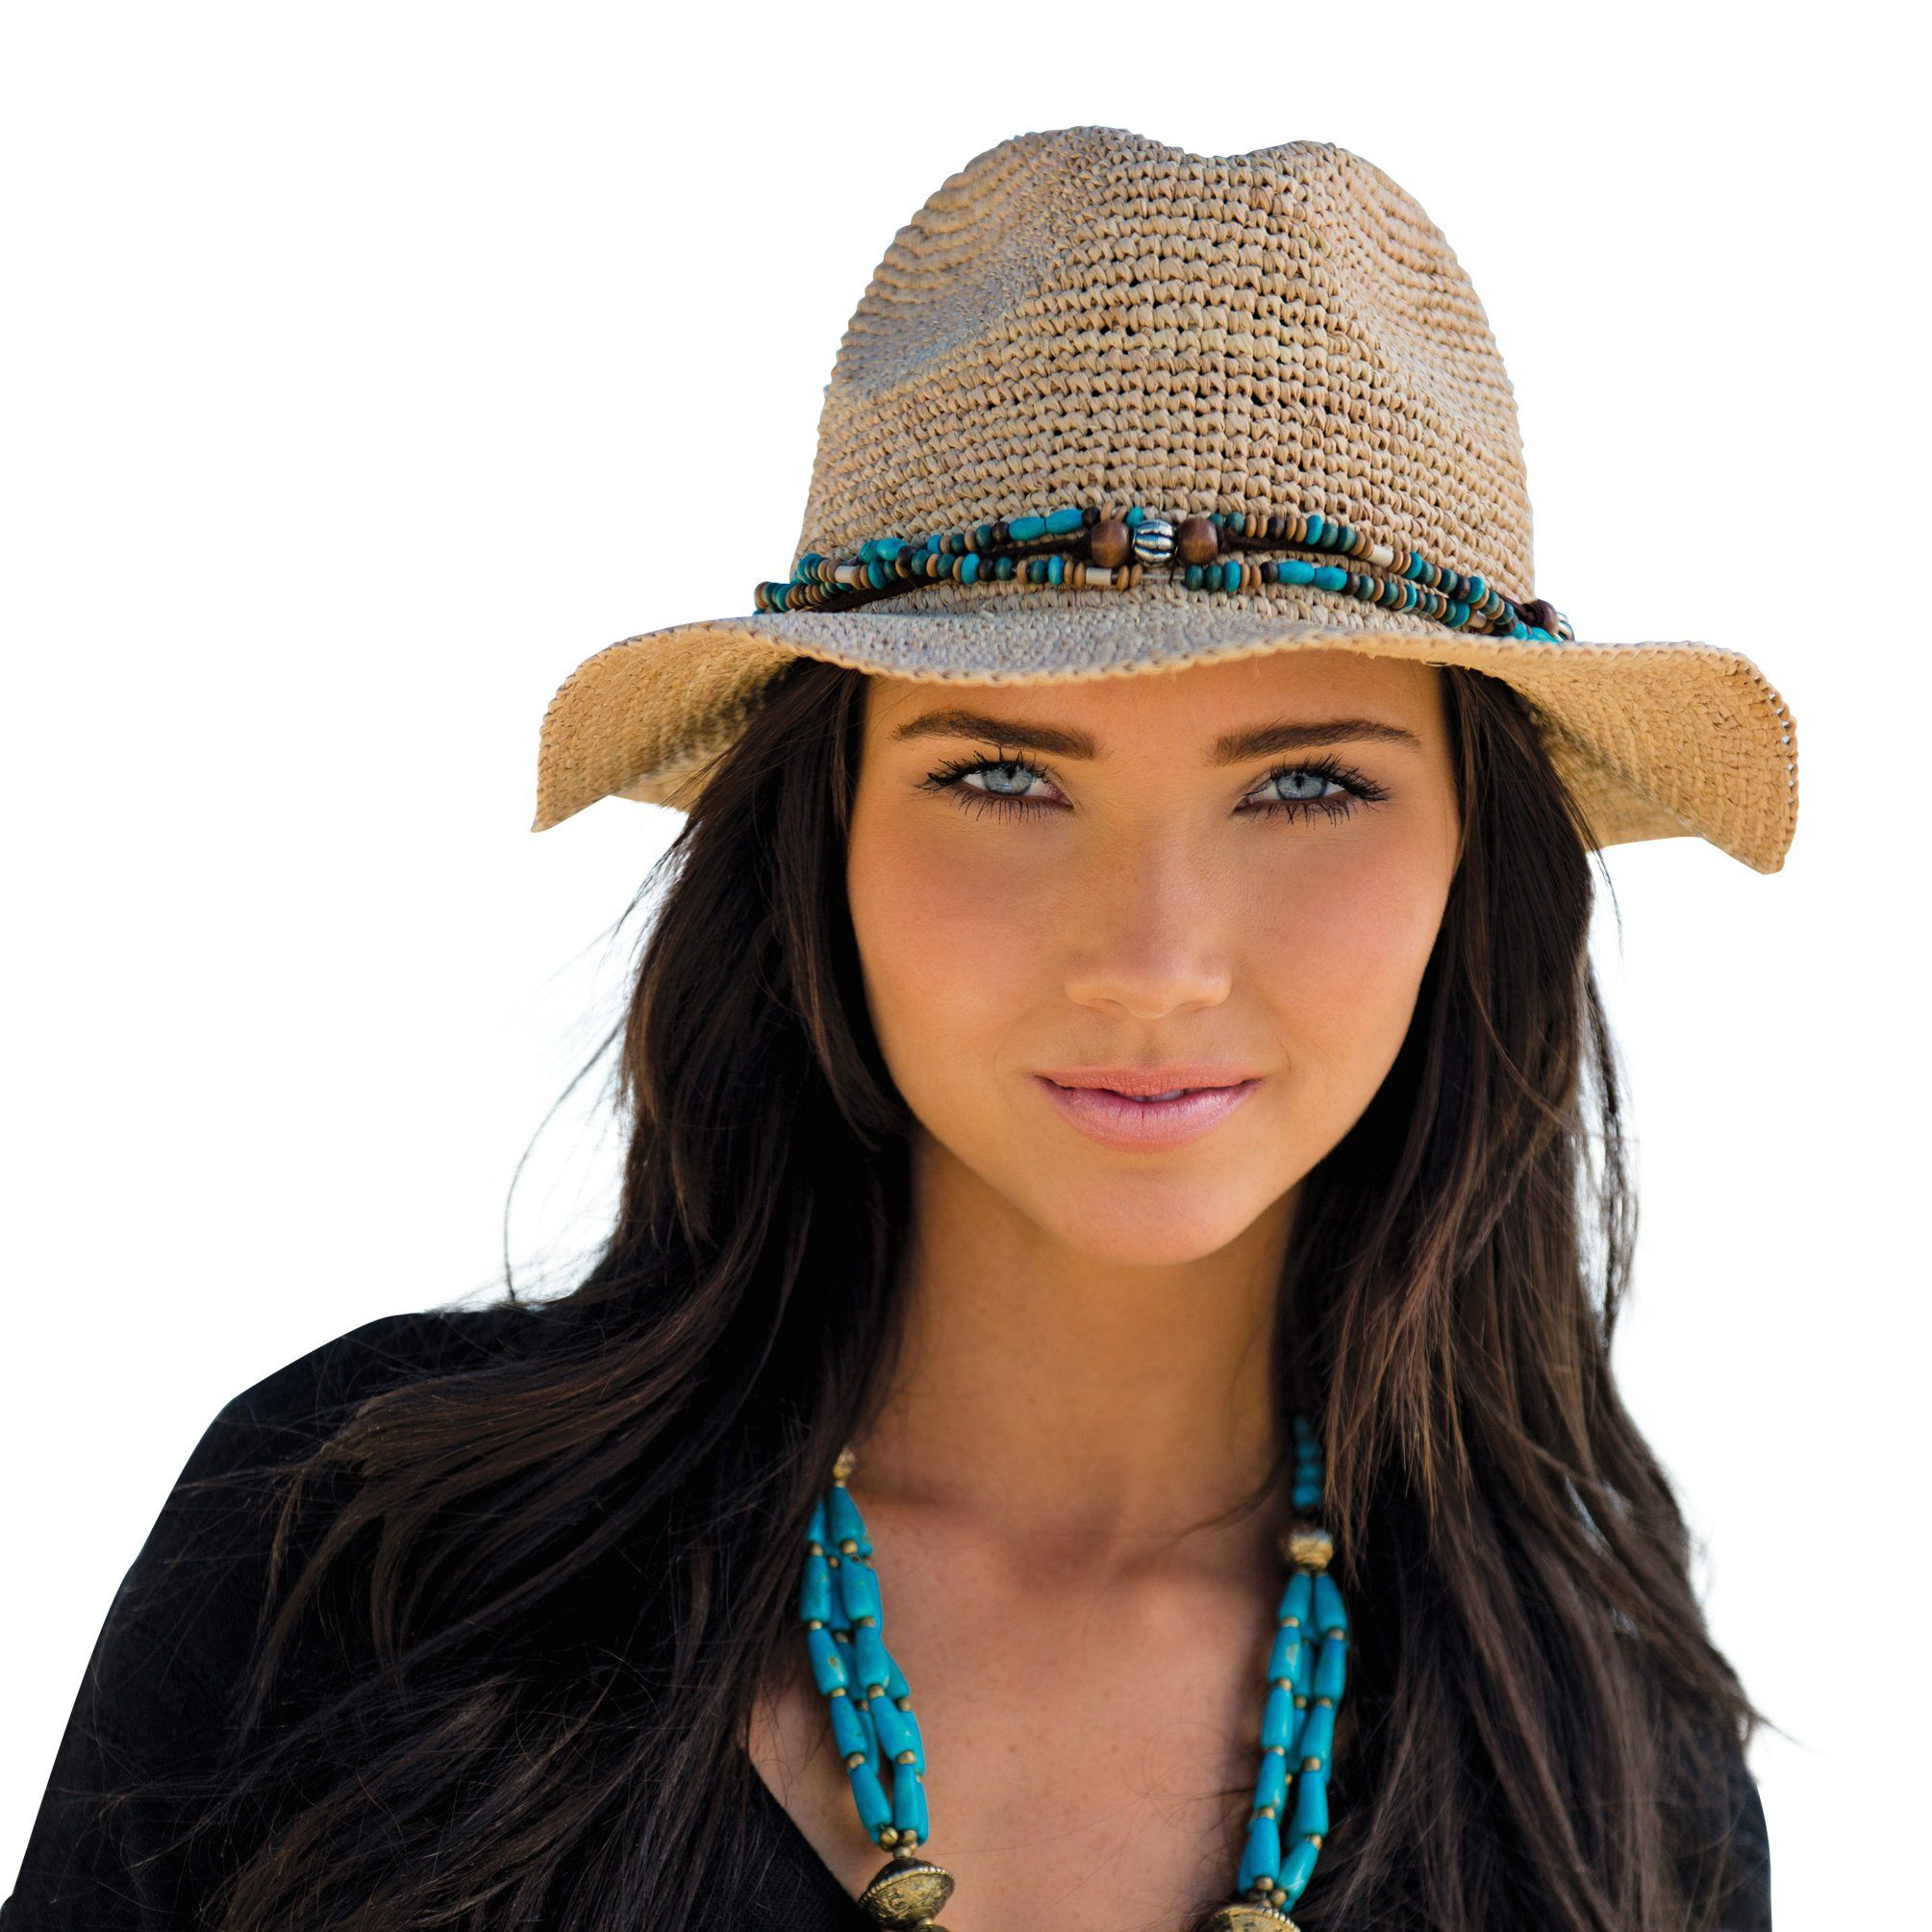 d69d48e9699 Kooringal Ladies Fedora Bora Bora Womens Sun   Beach Hat (Natural ...